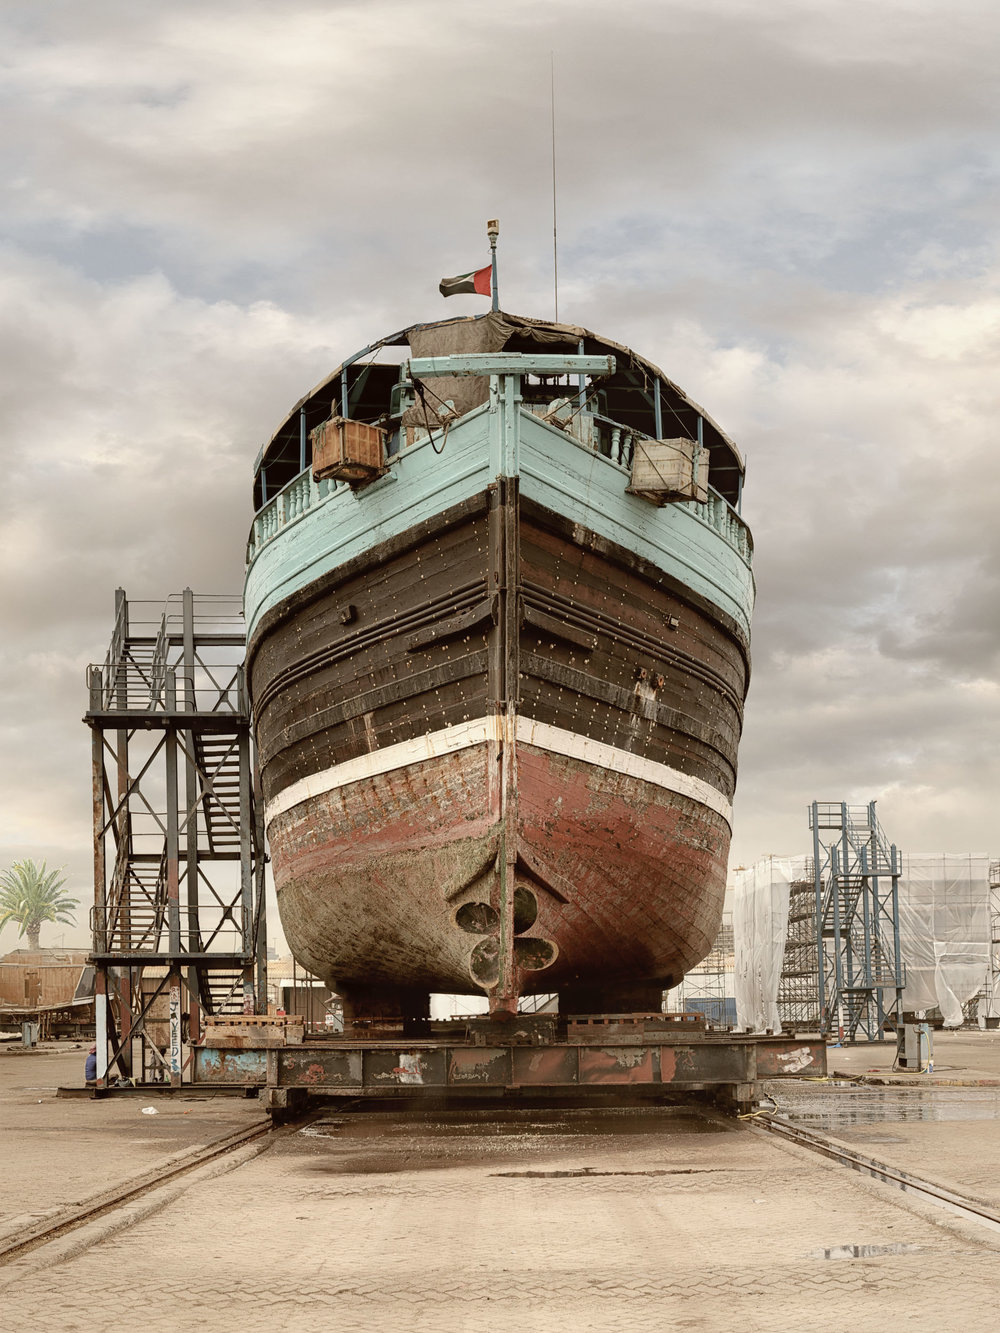 Ship VI - Al Jaddaf Marine Dry Docks - Dubai 2017